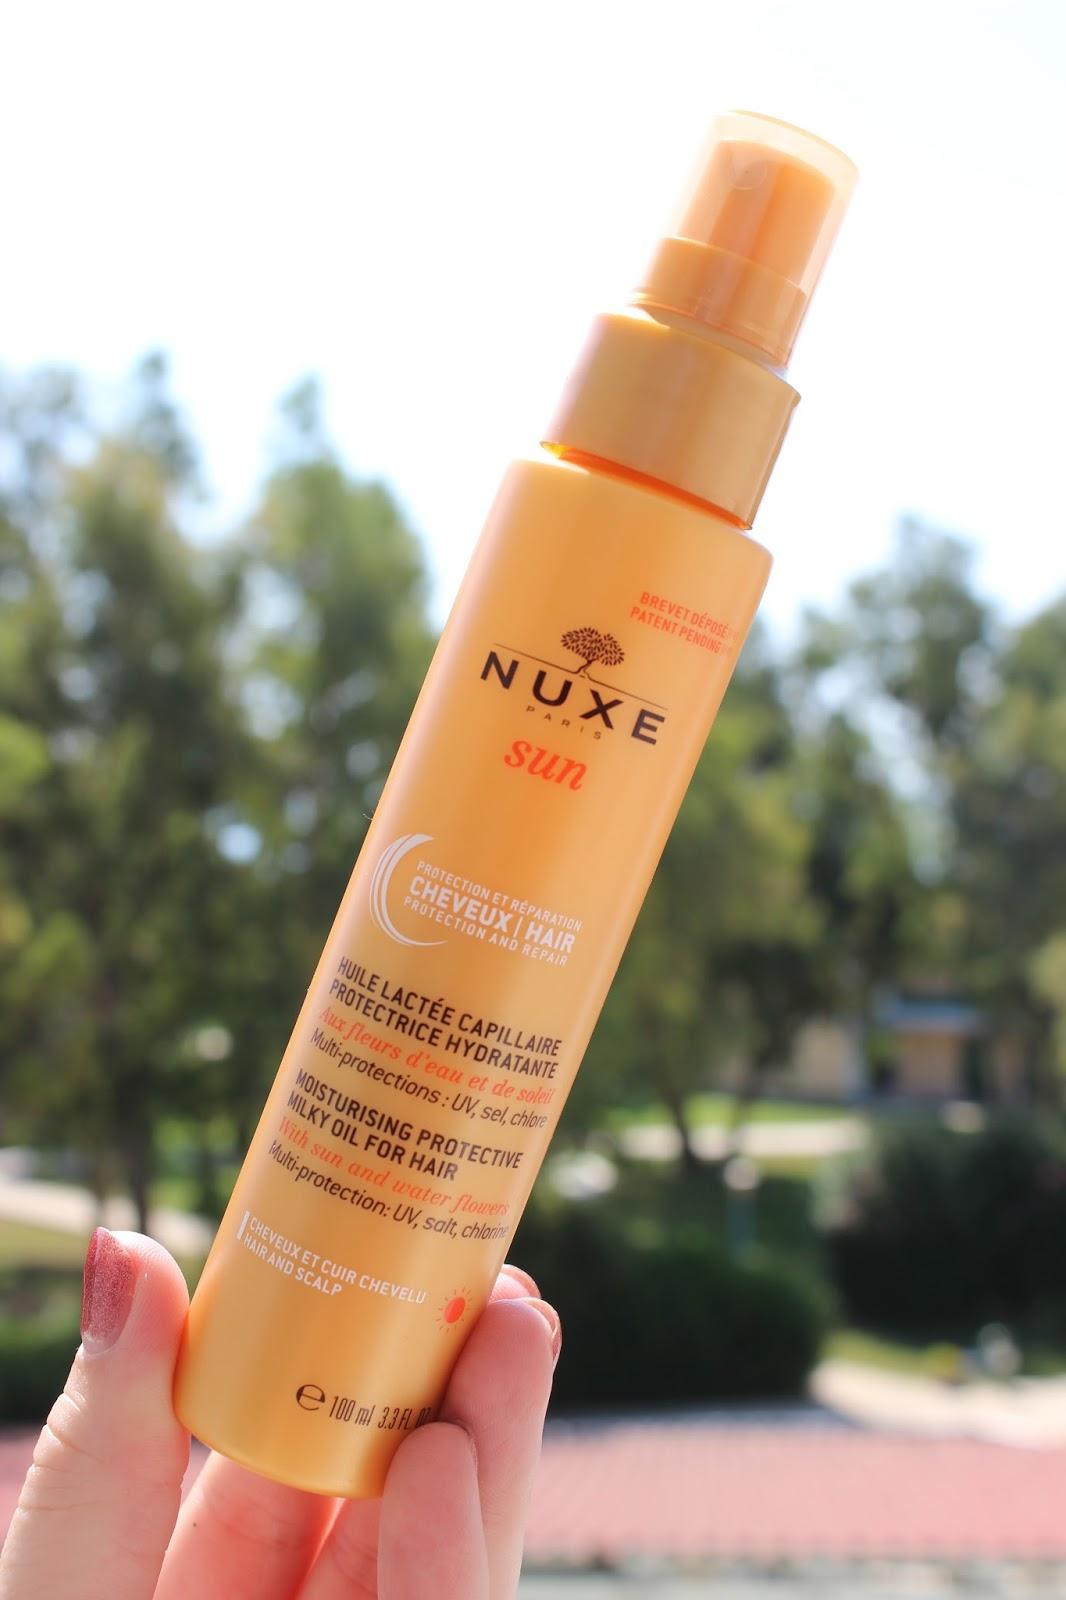 Summer Hair Savour: NUXE Sun Moisturising Protective Milky Oil